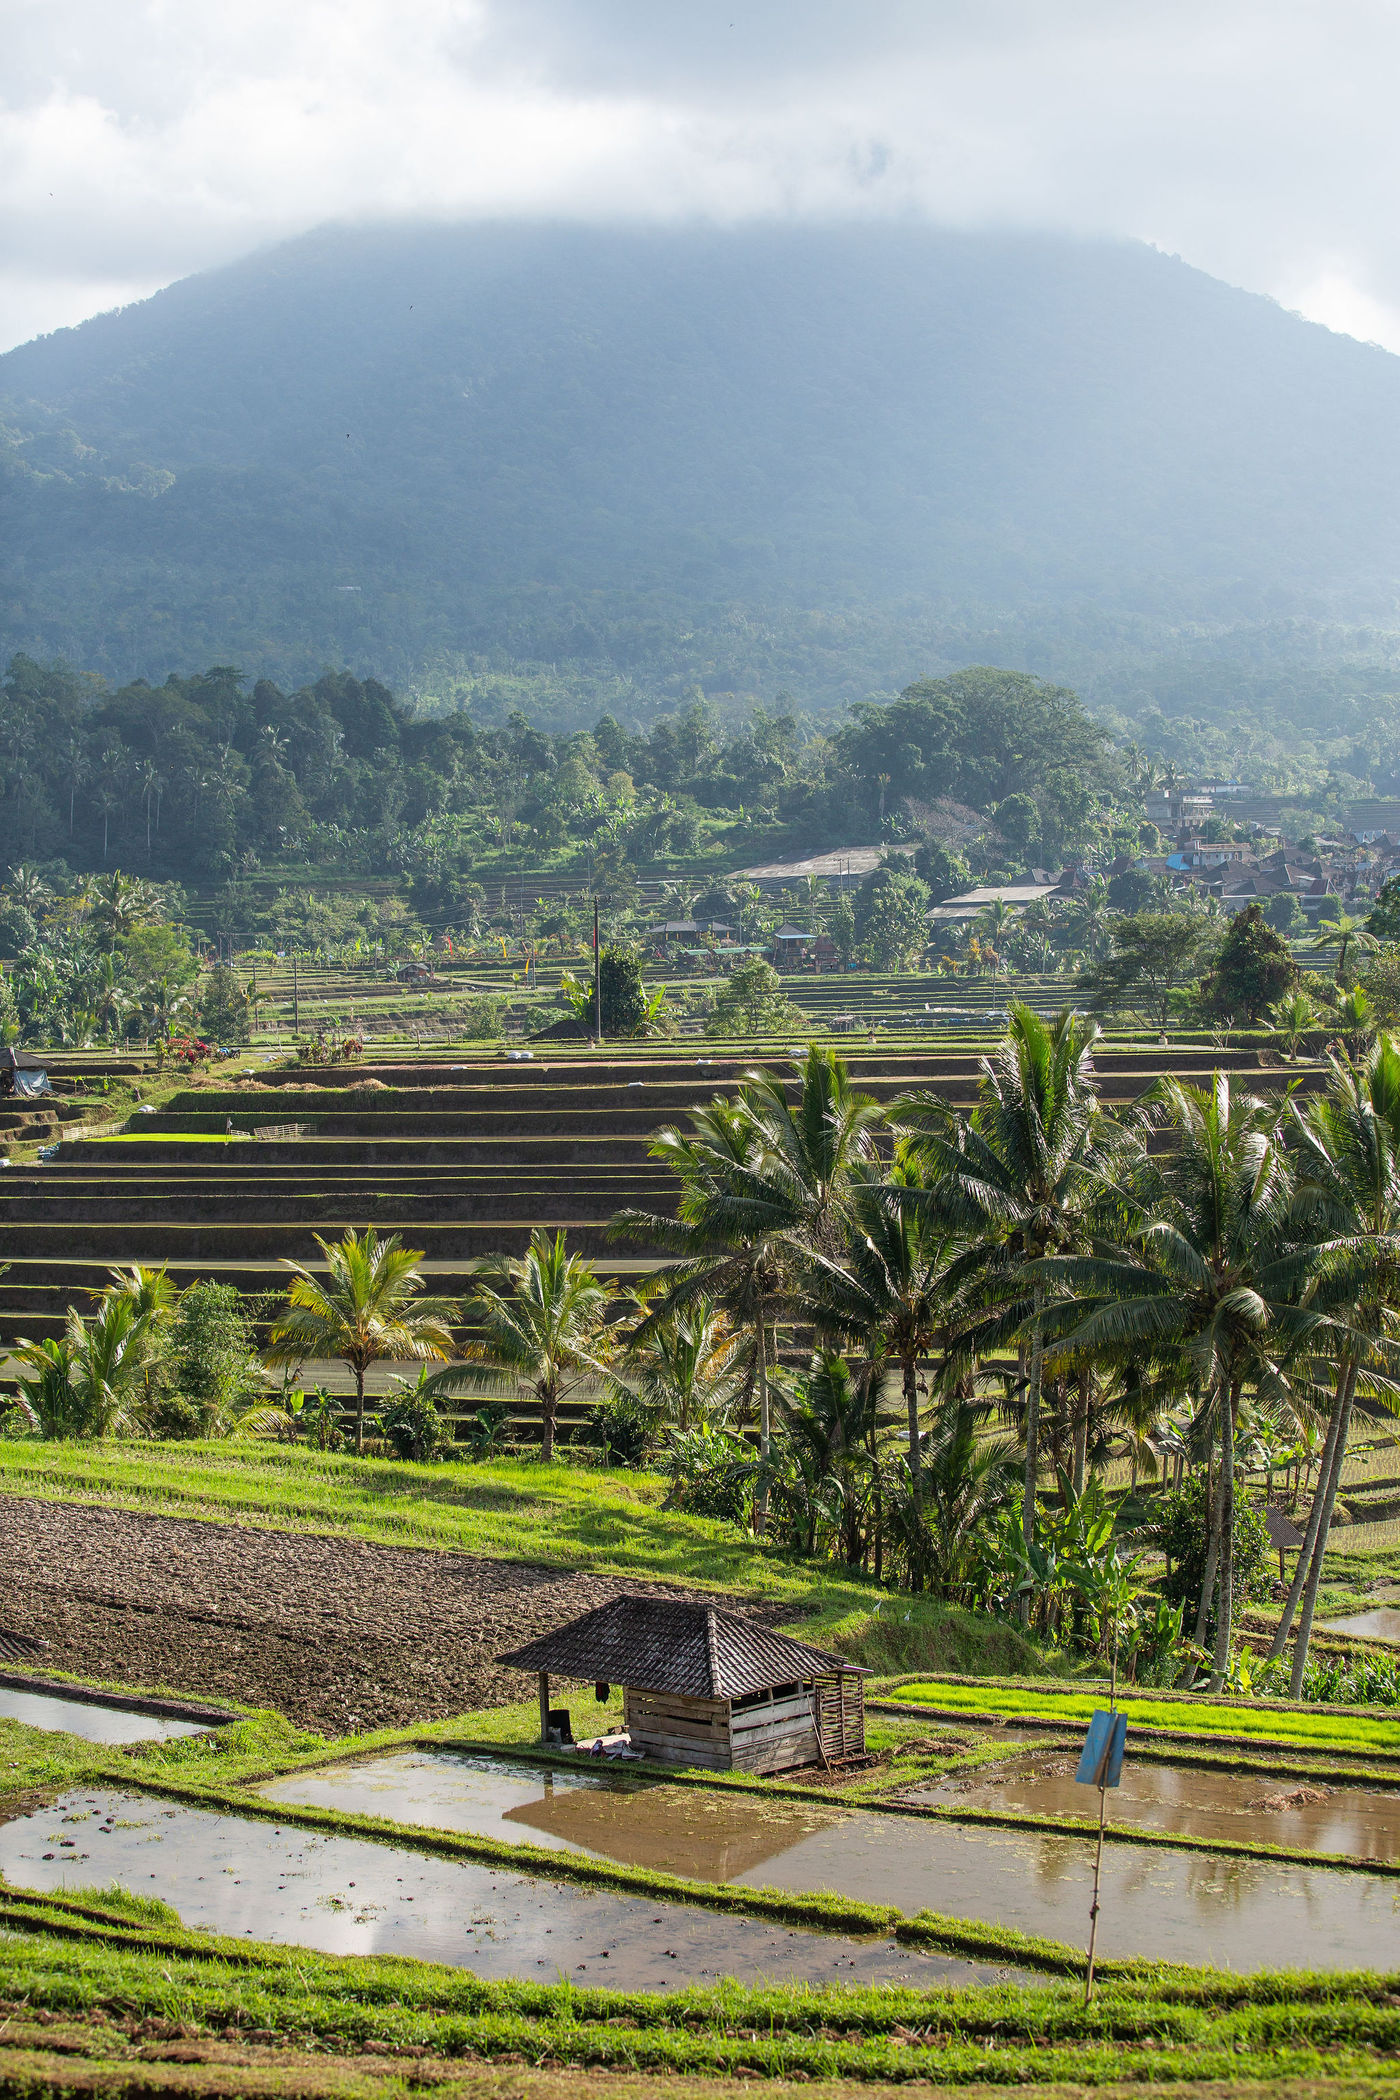 TheWrightLine-Bali-Stills-29-1400x2100-801aa923-e07c-4f04-9b33-ce2bf797a754.jpg